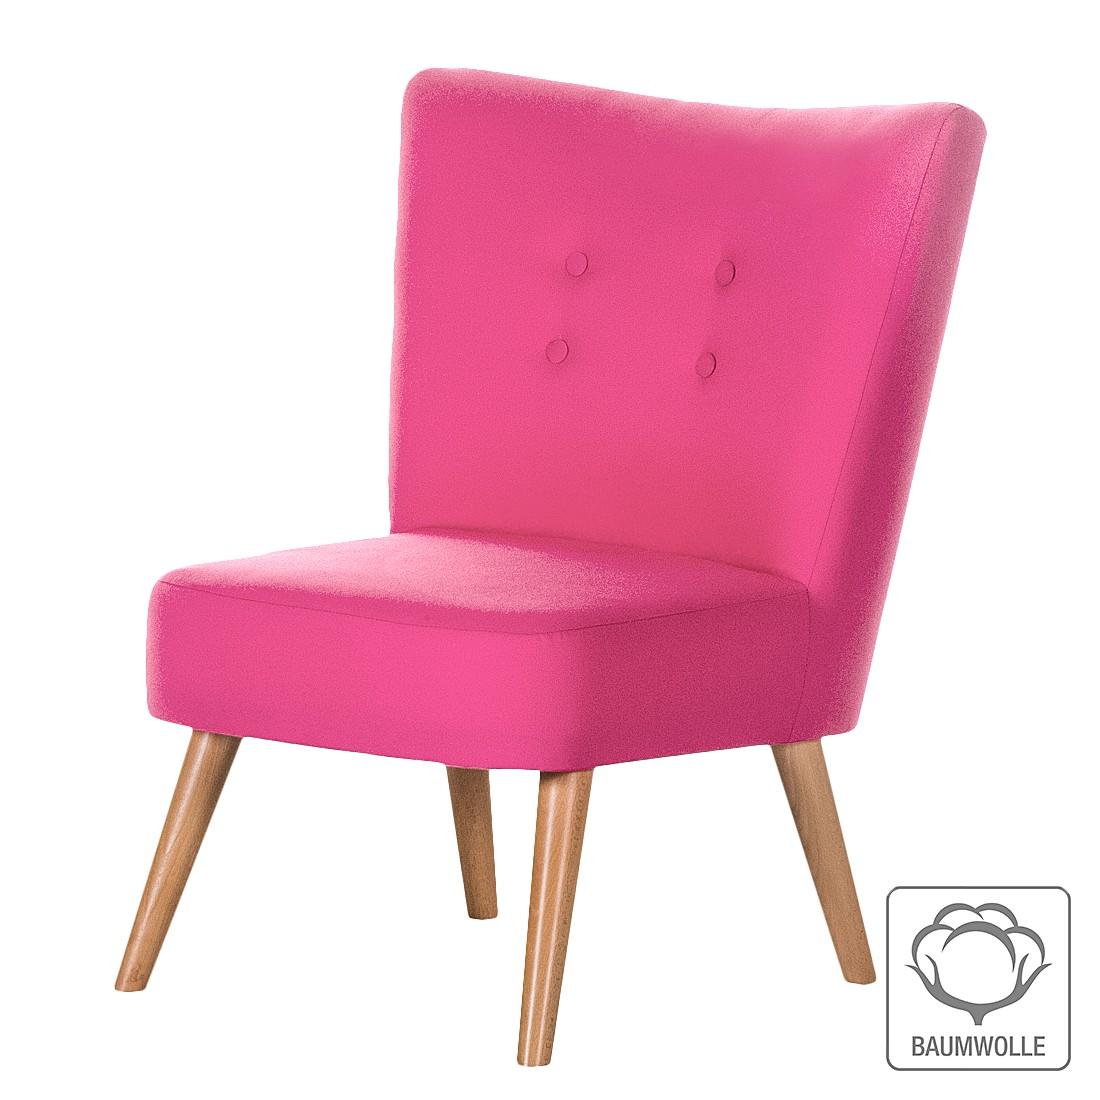 Sessel Mikkel – Baumwollstoff Pink, Morteens günstig